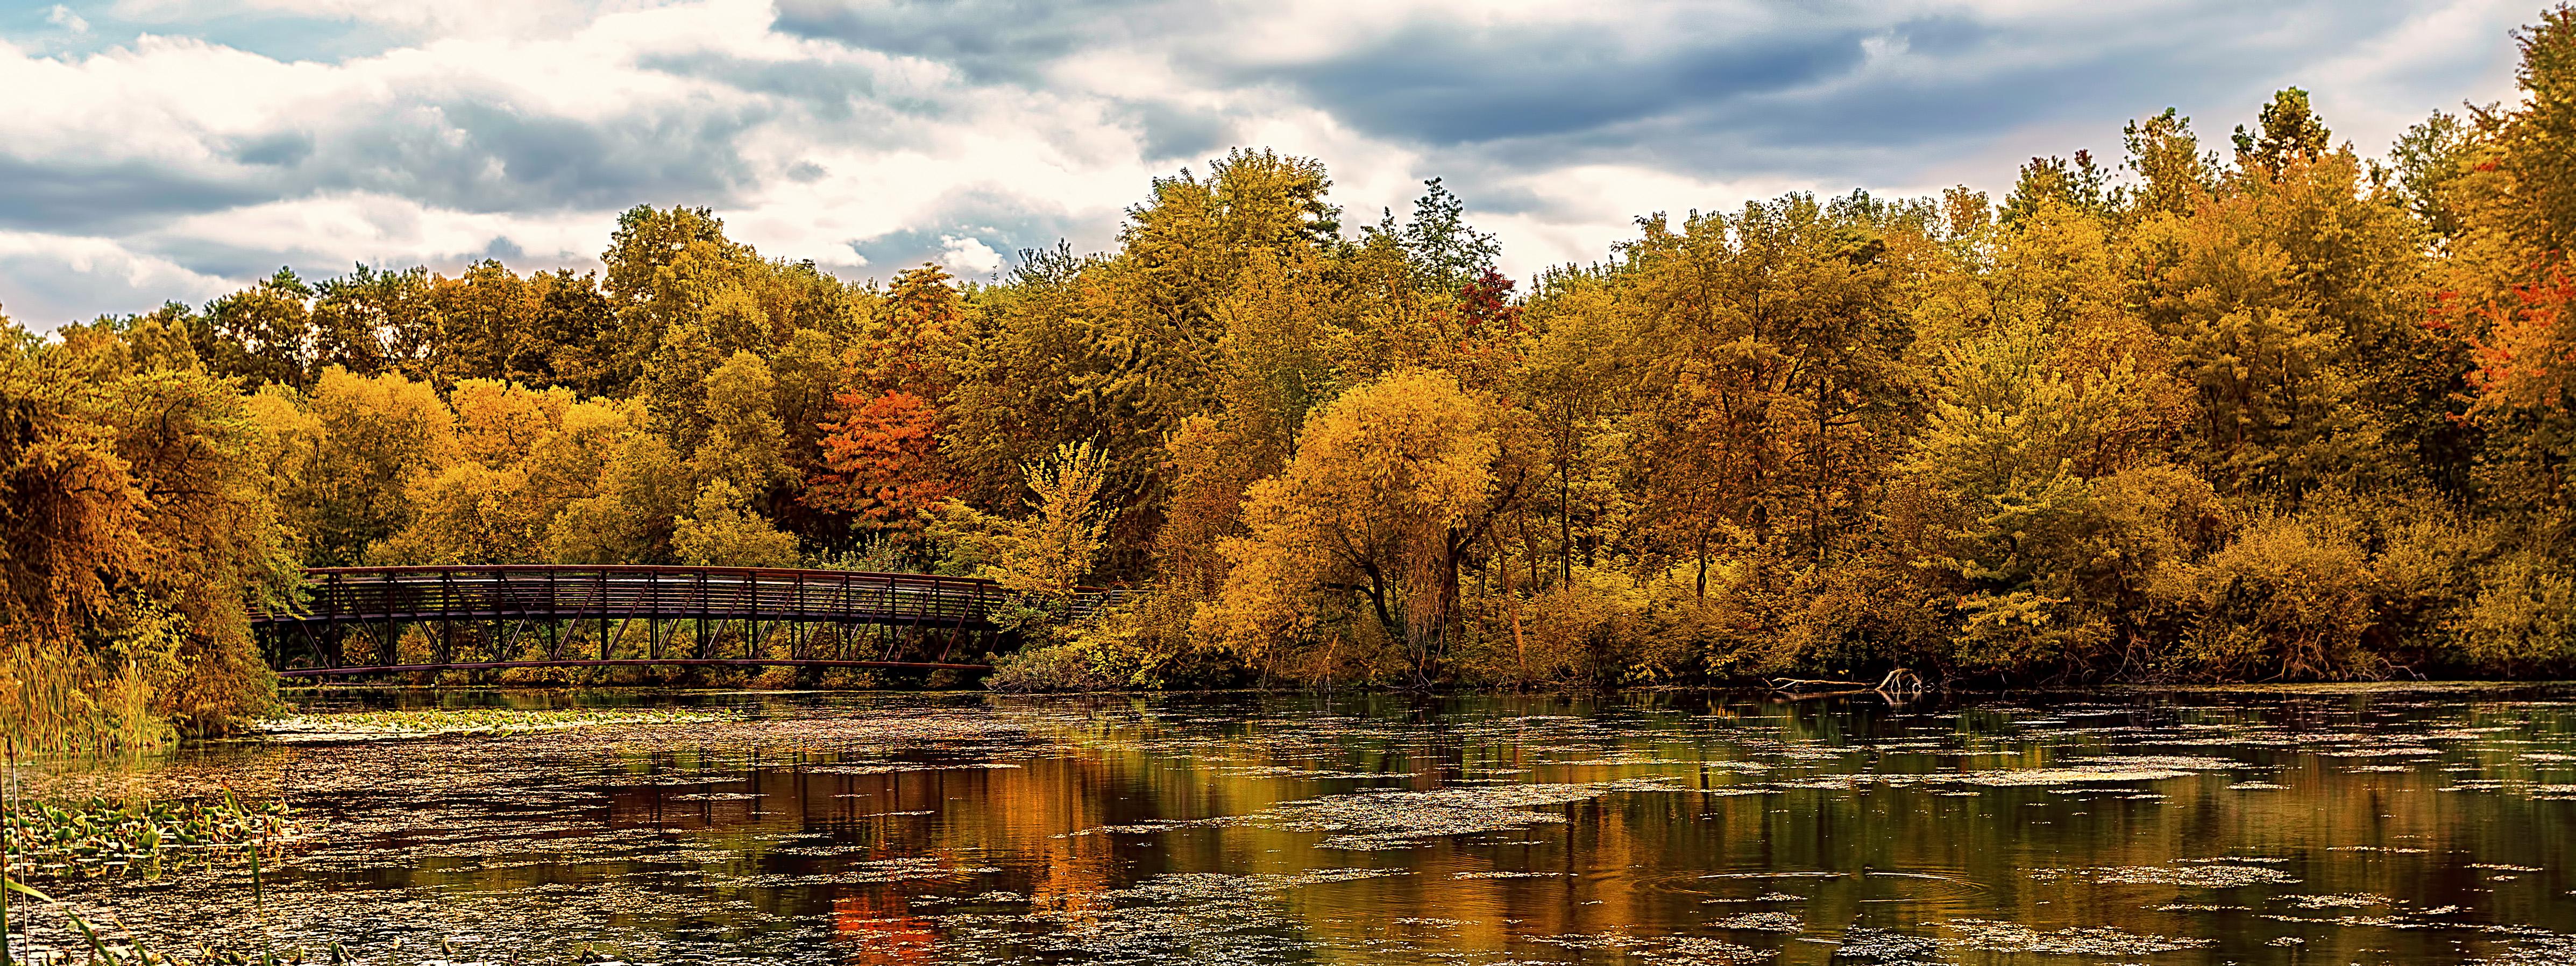 Fall Foliage Computer Wallpaper Bridge Beginning Of November Edward Byrne Photography